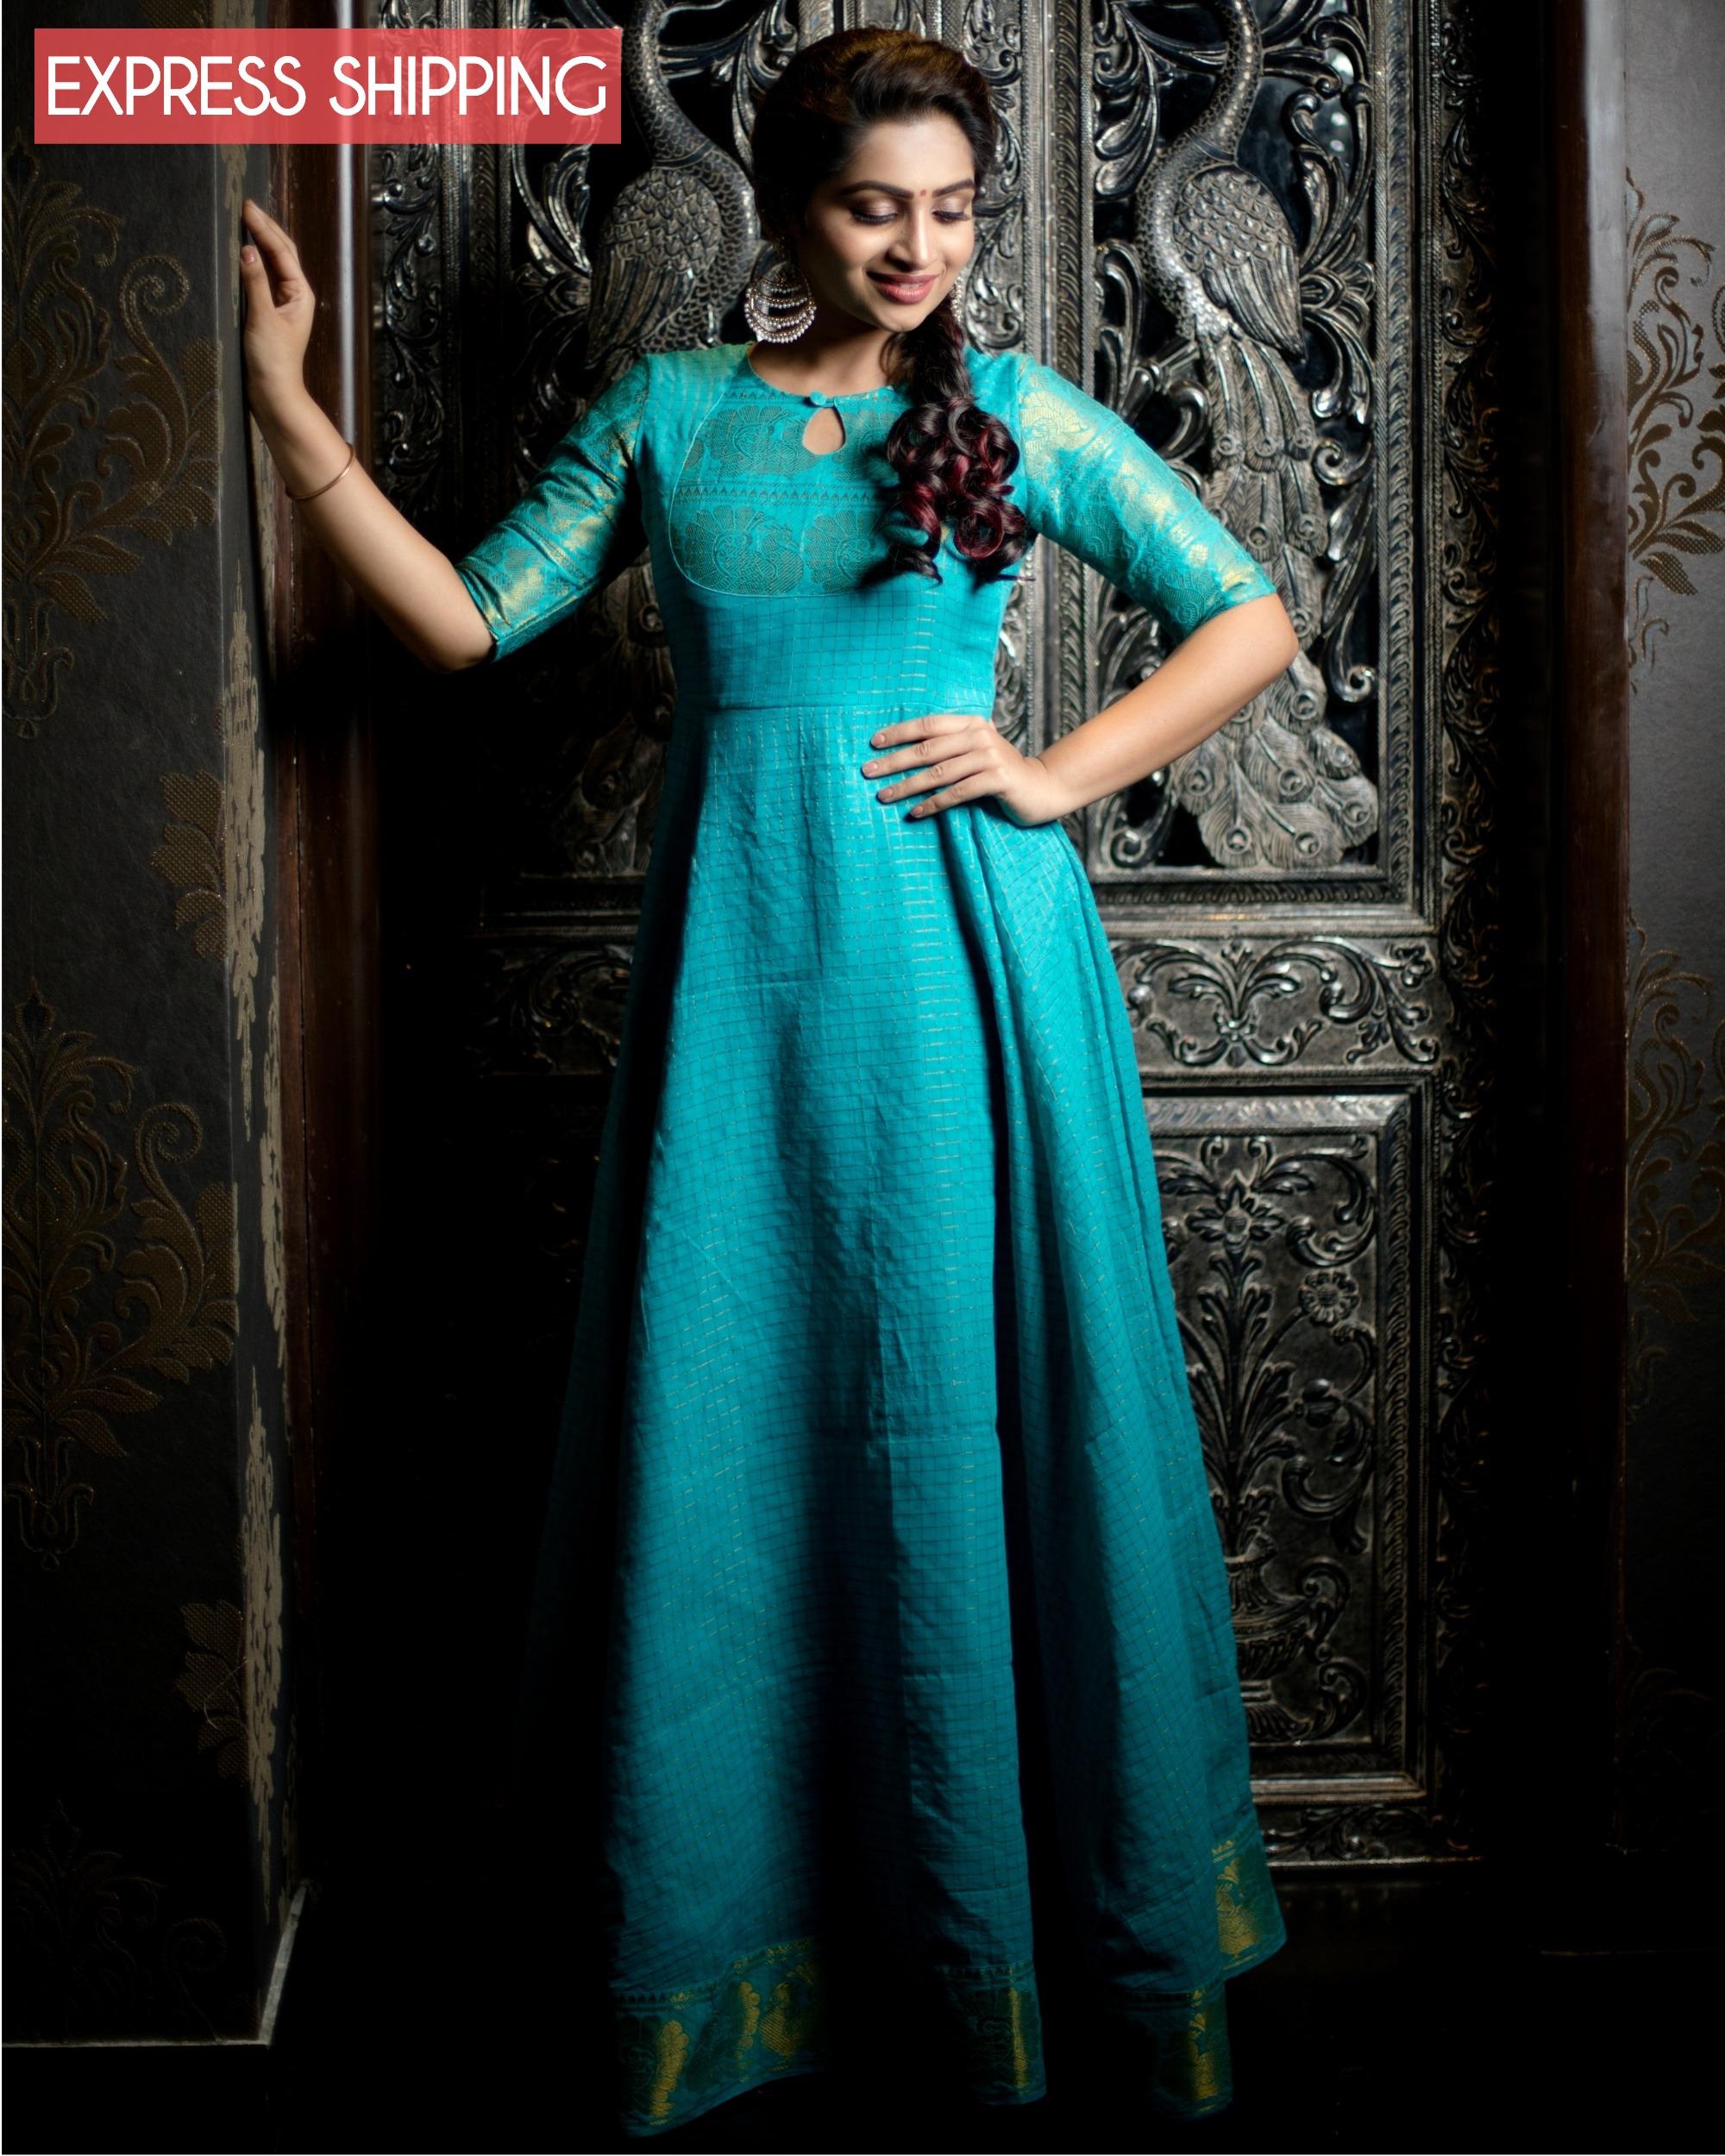 Turquoise and gold madurai cotton maxi